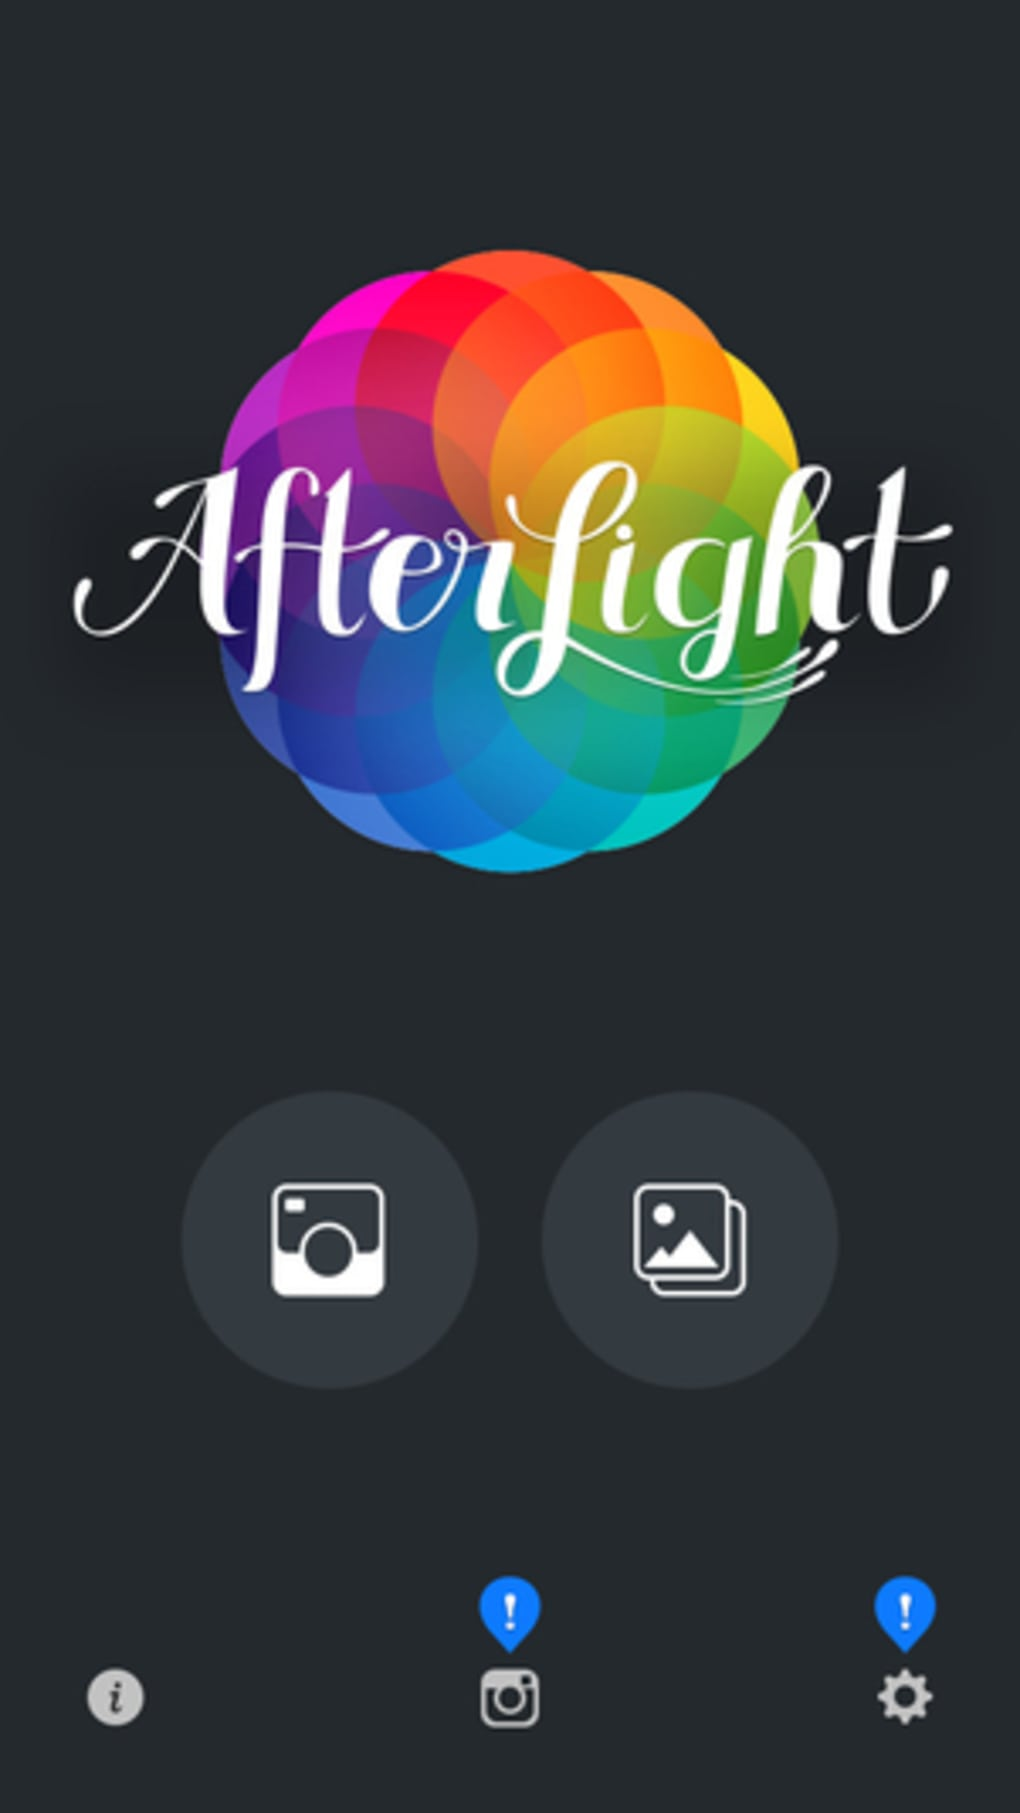 afterlight kostenlos